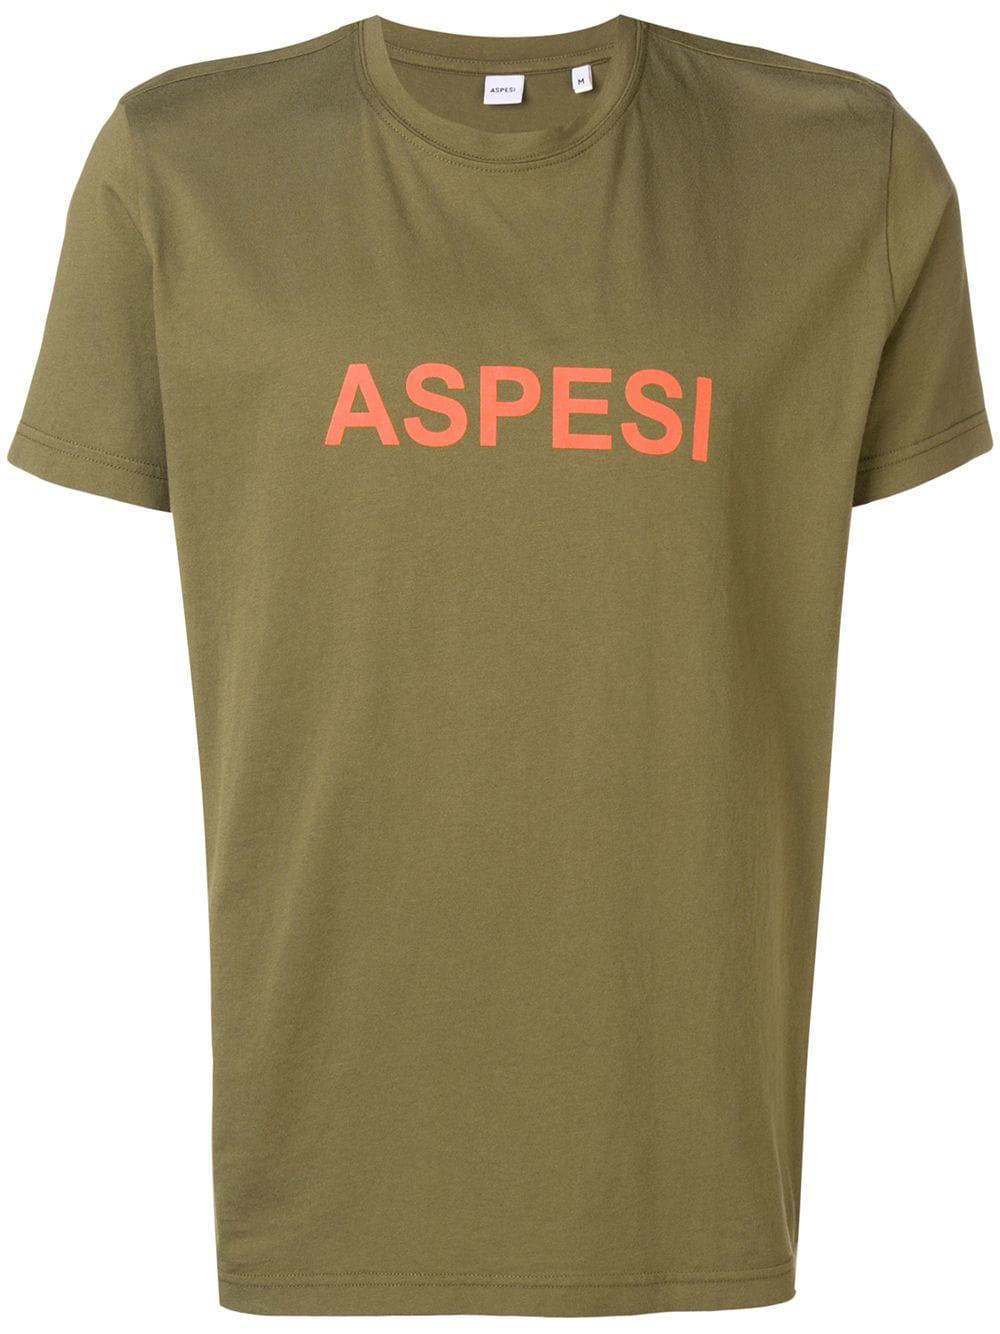 f661ef03f05612 Aspesi T-Shirt Mit Rundem Ausschnitt - GrüN In Green